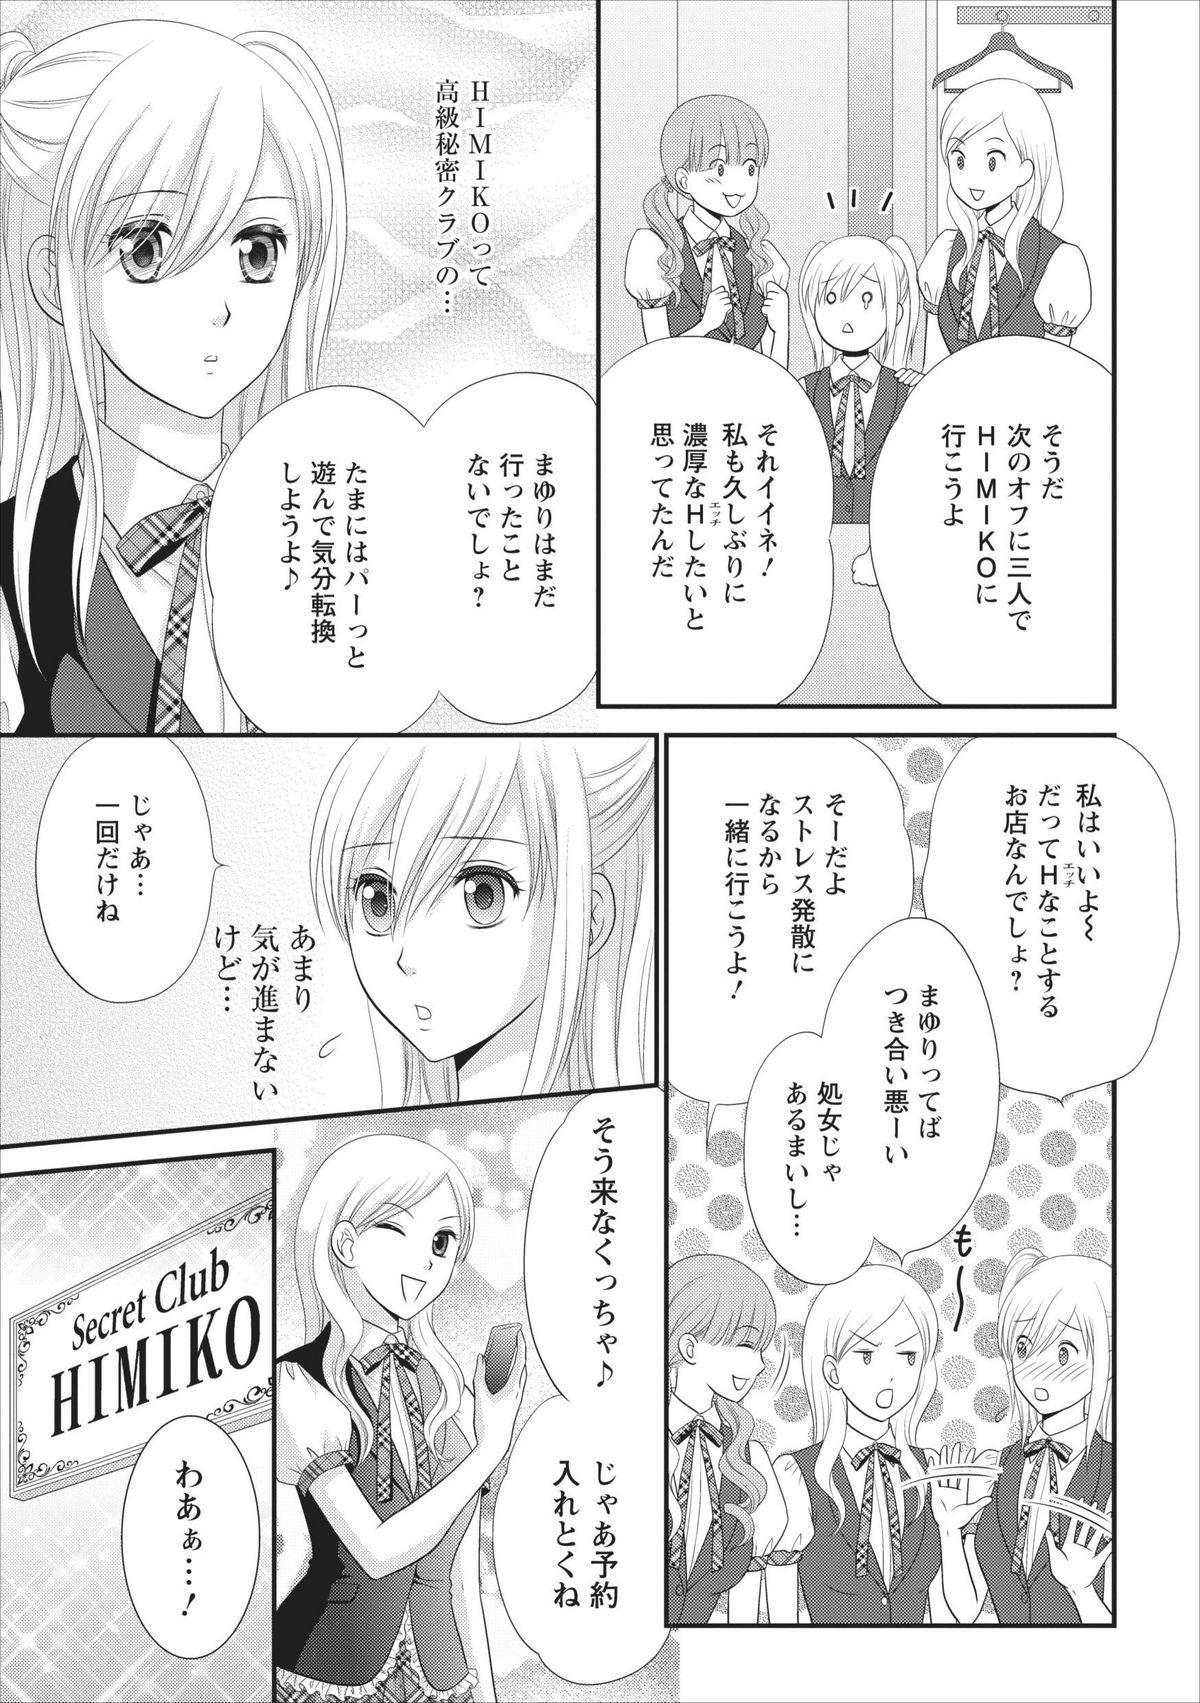 Himitsu Club Himiko - Inwai Kan no Joou ch.2 3